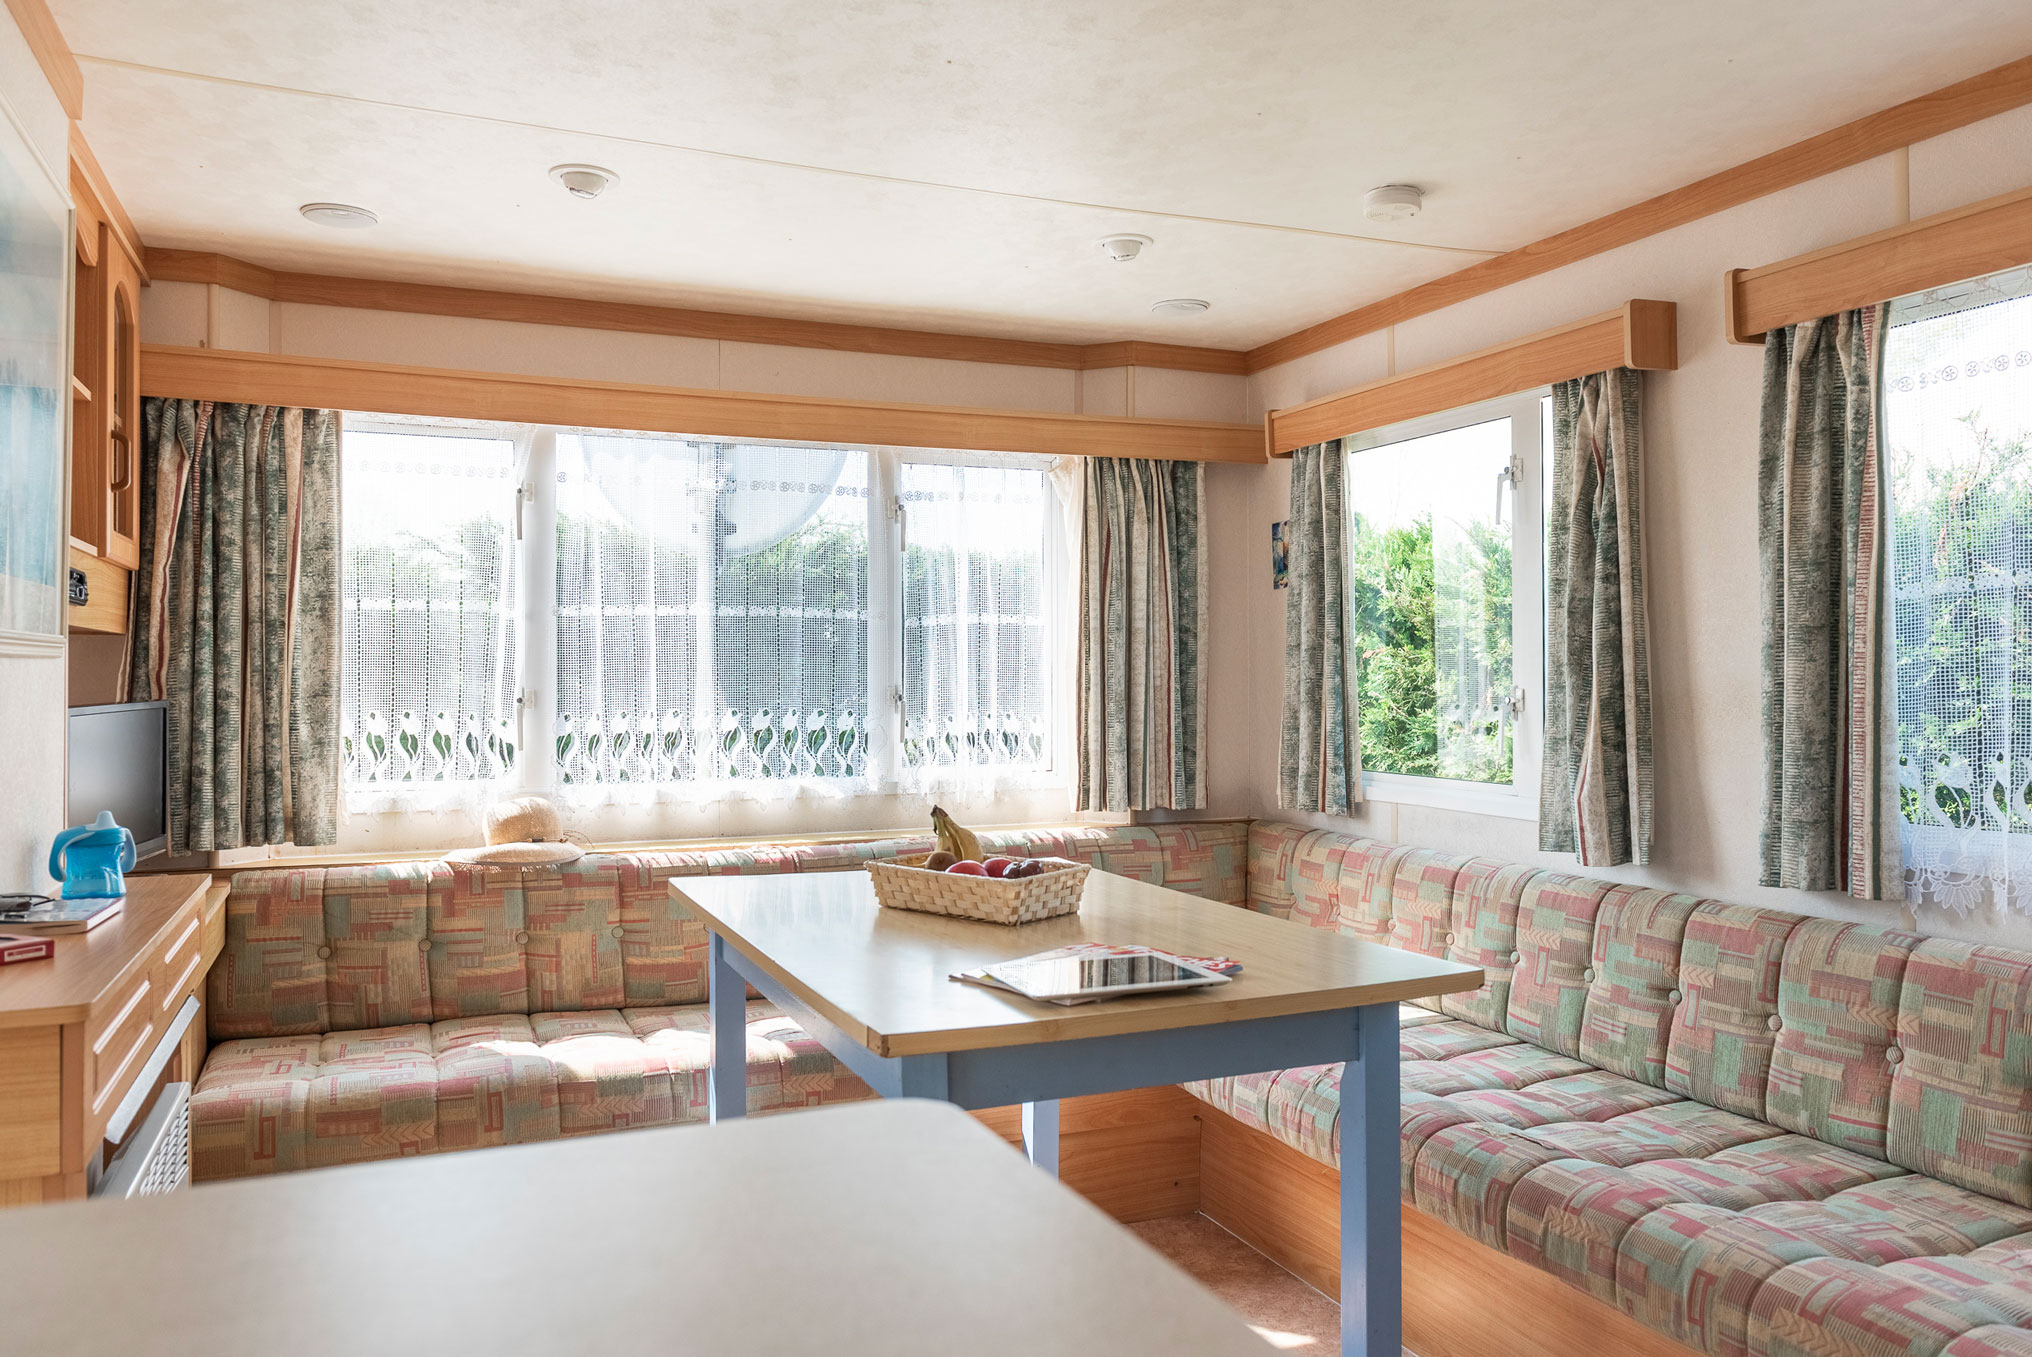 location-mobil-home-6-8-personnes-eco-salon-camping-le-port-de-moricq